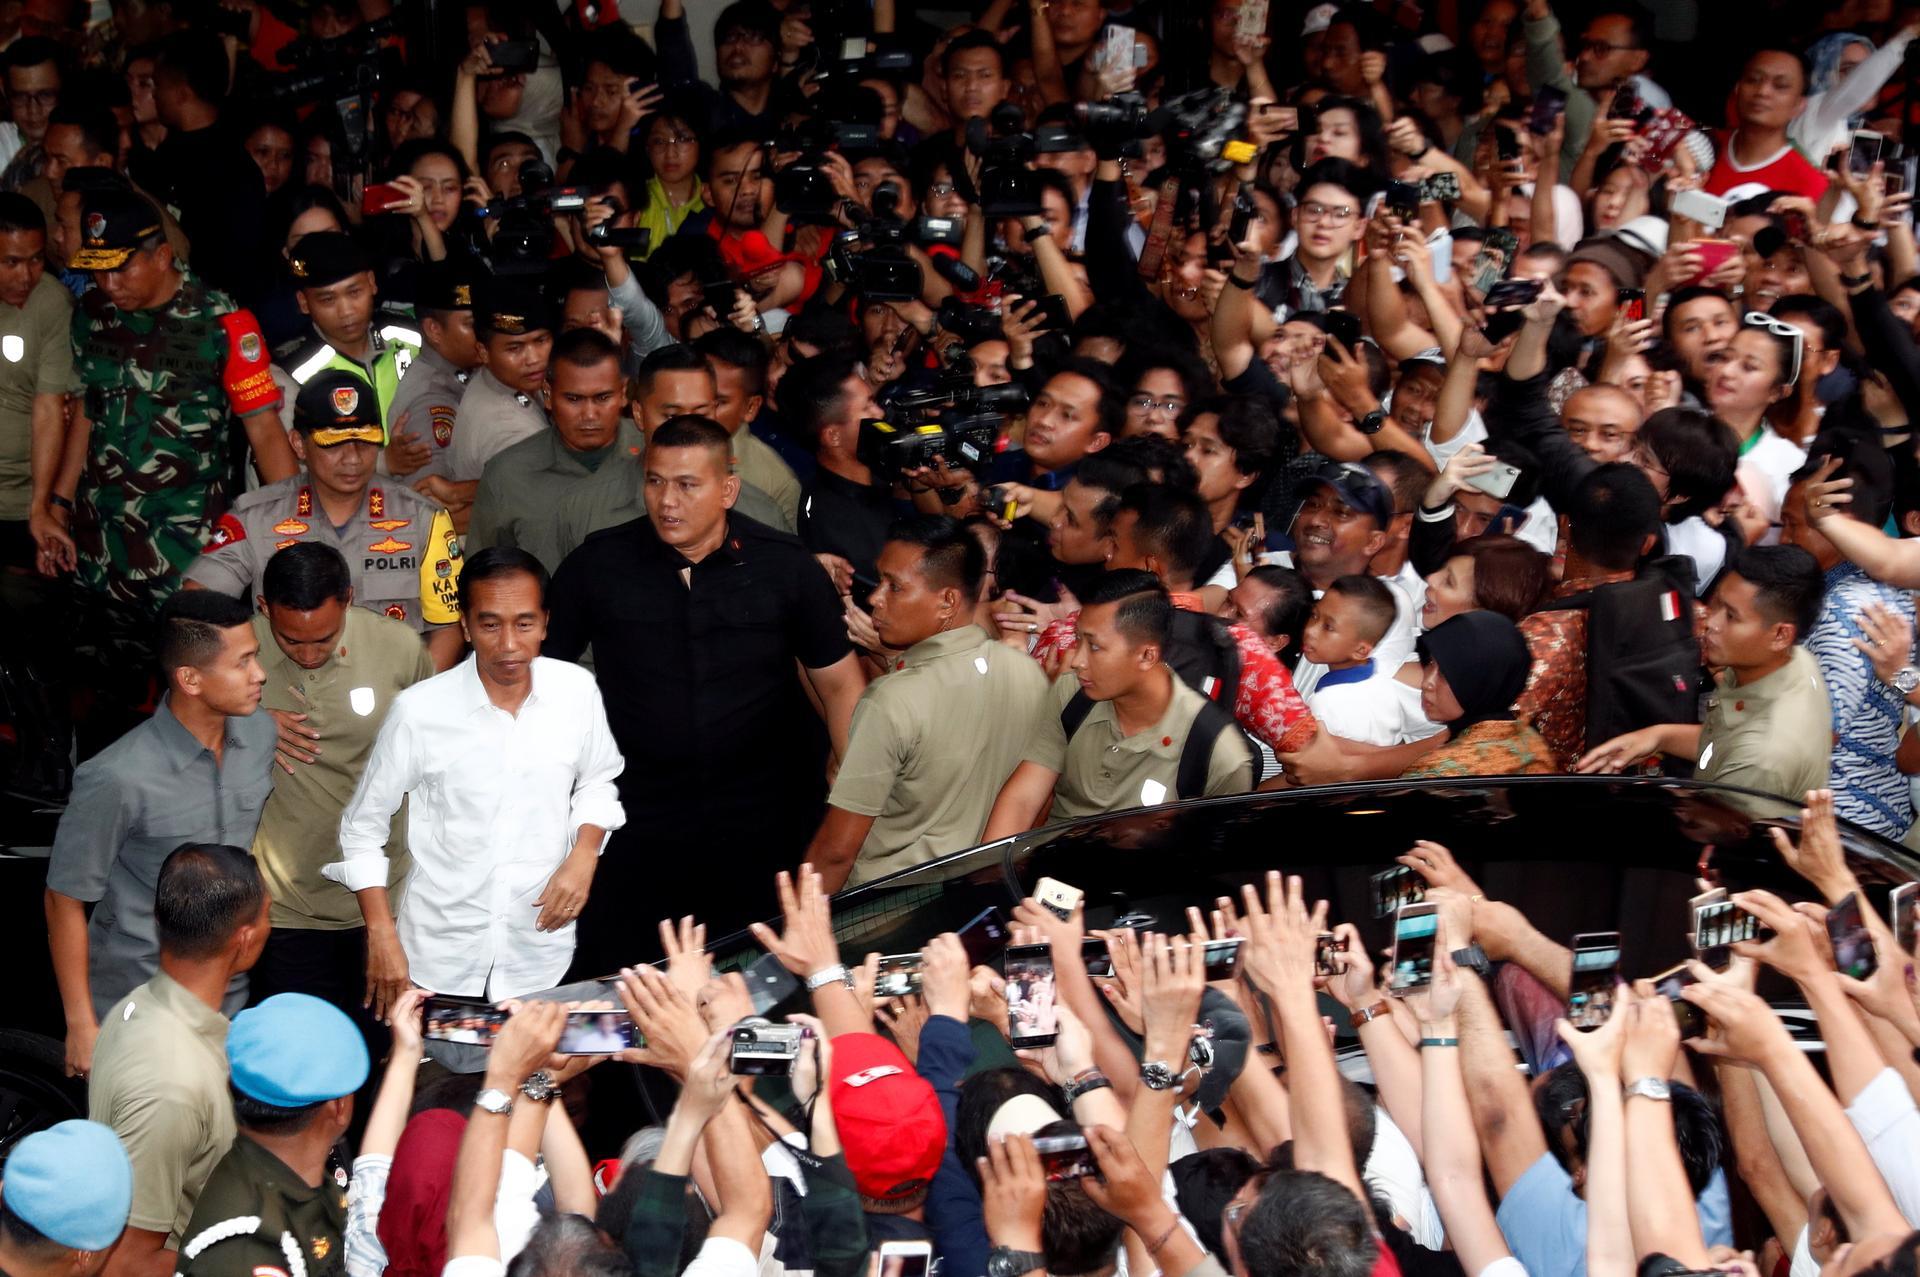 Indonesian 'quick counts' underline Widodo poll win, markets rally